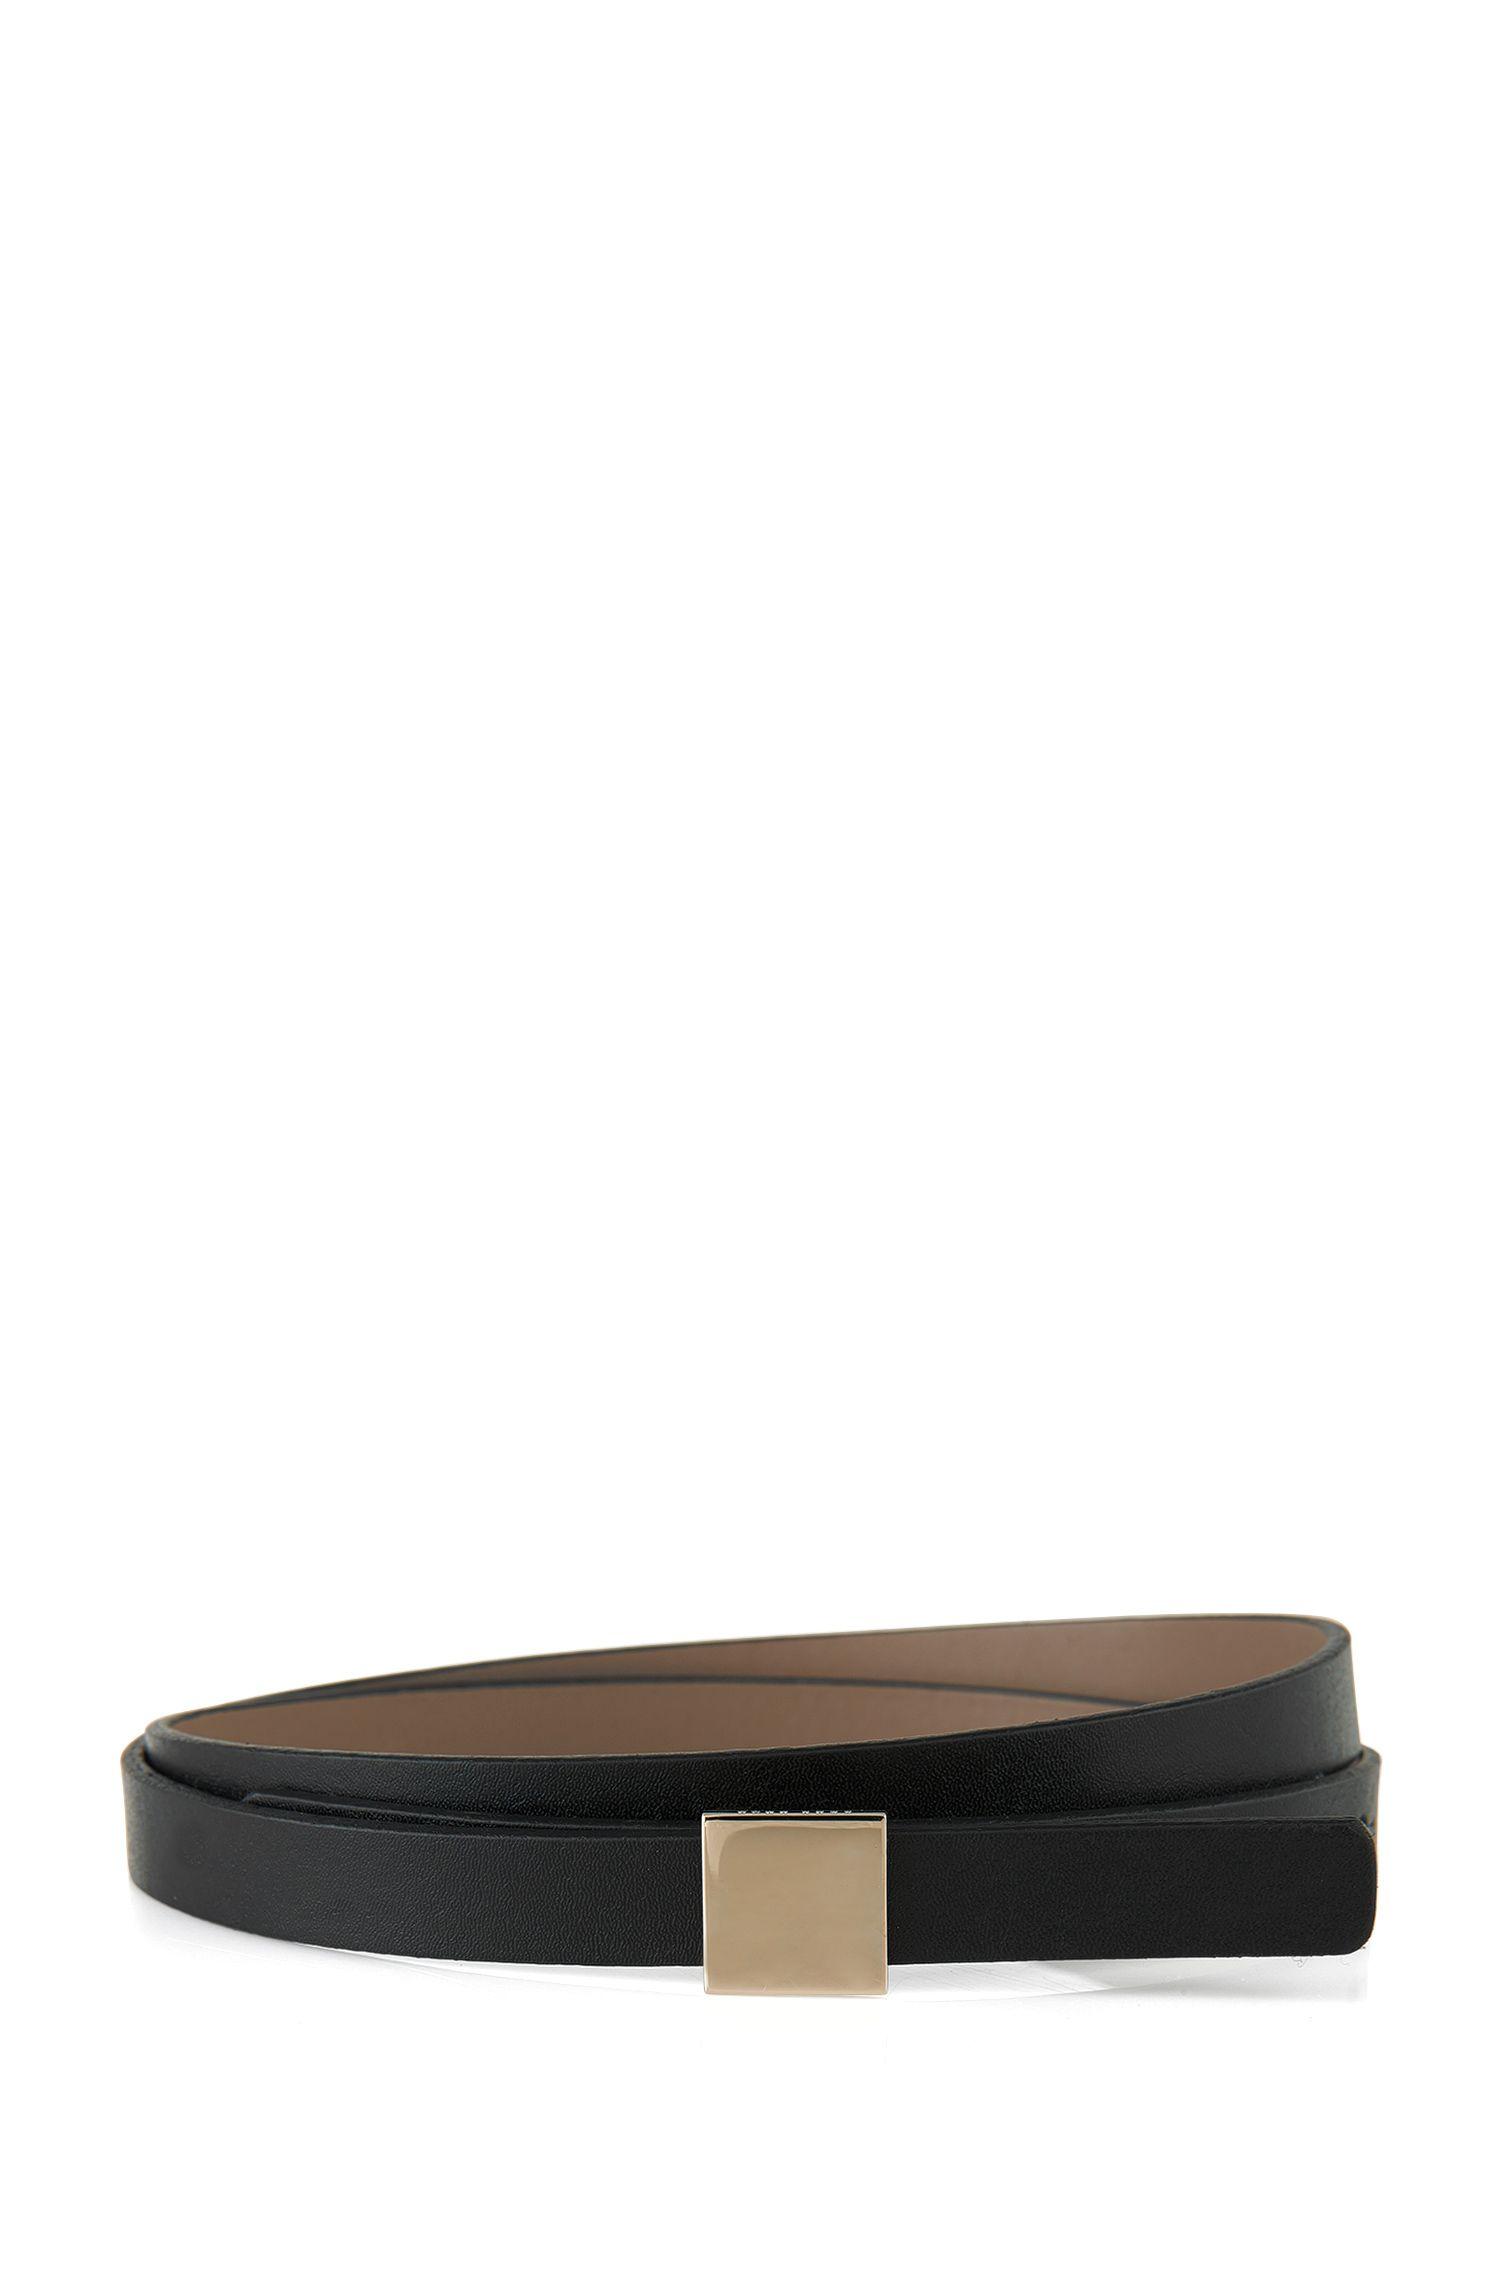 Leather belt with block hardware closure